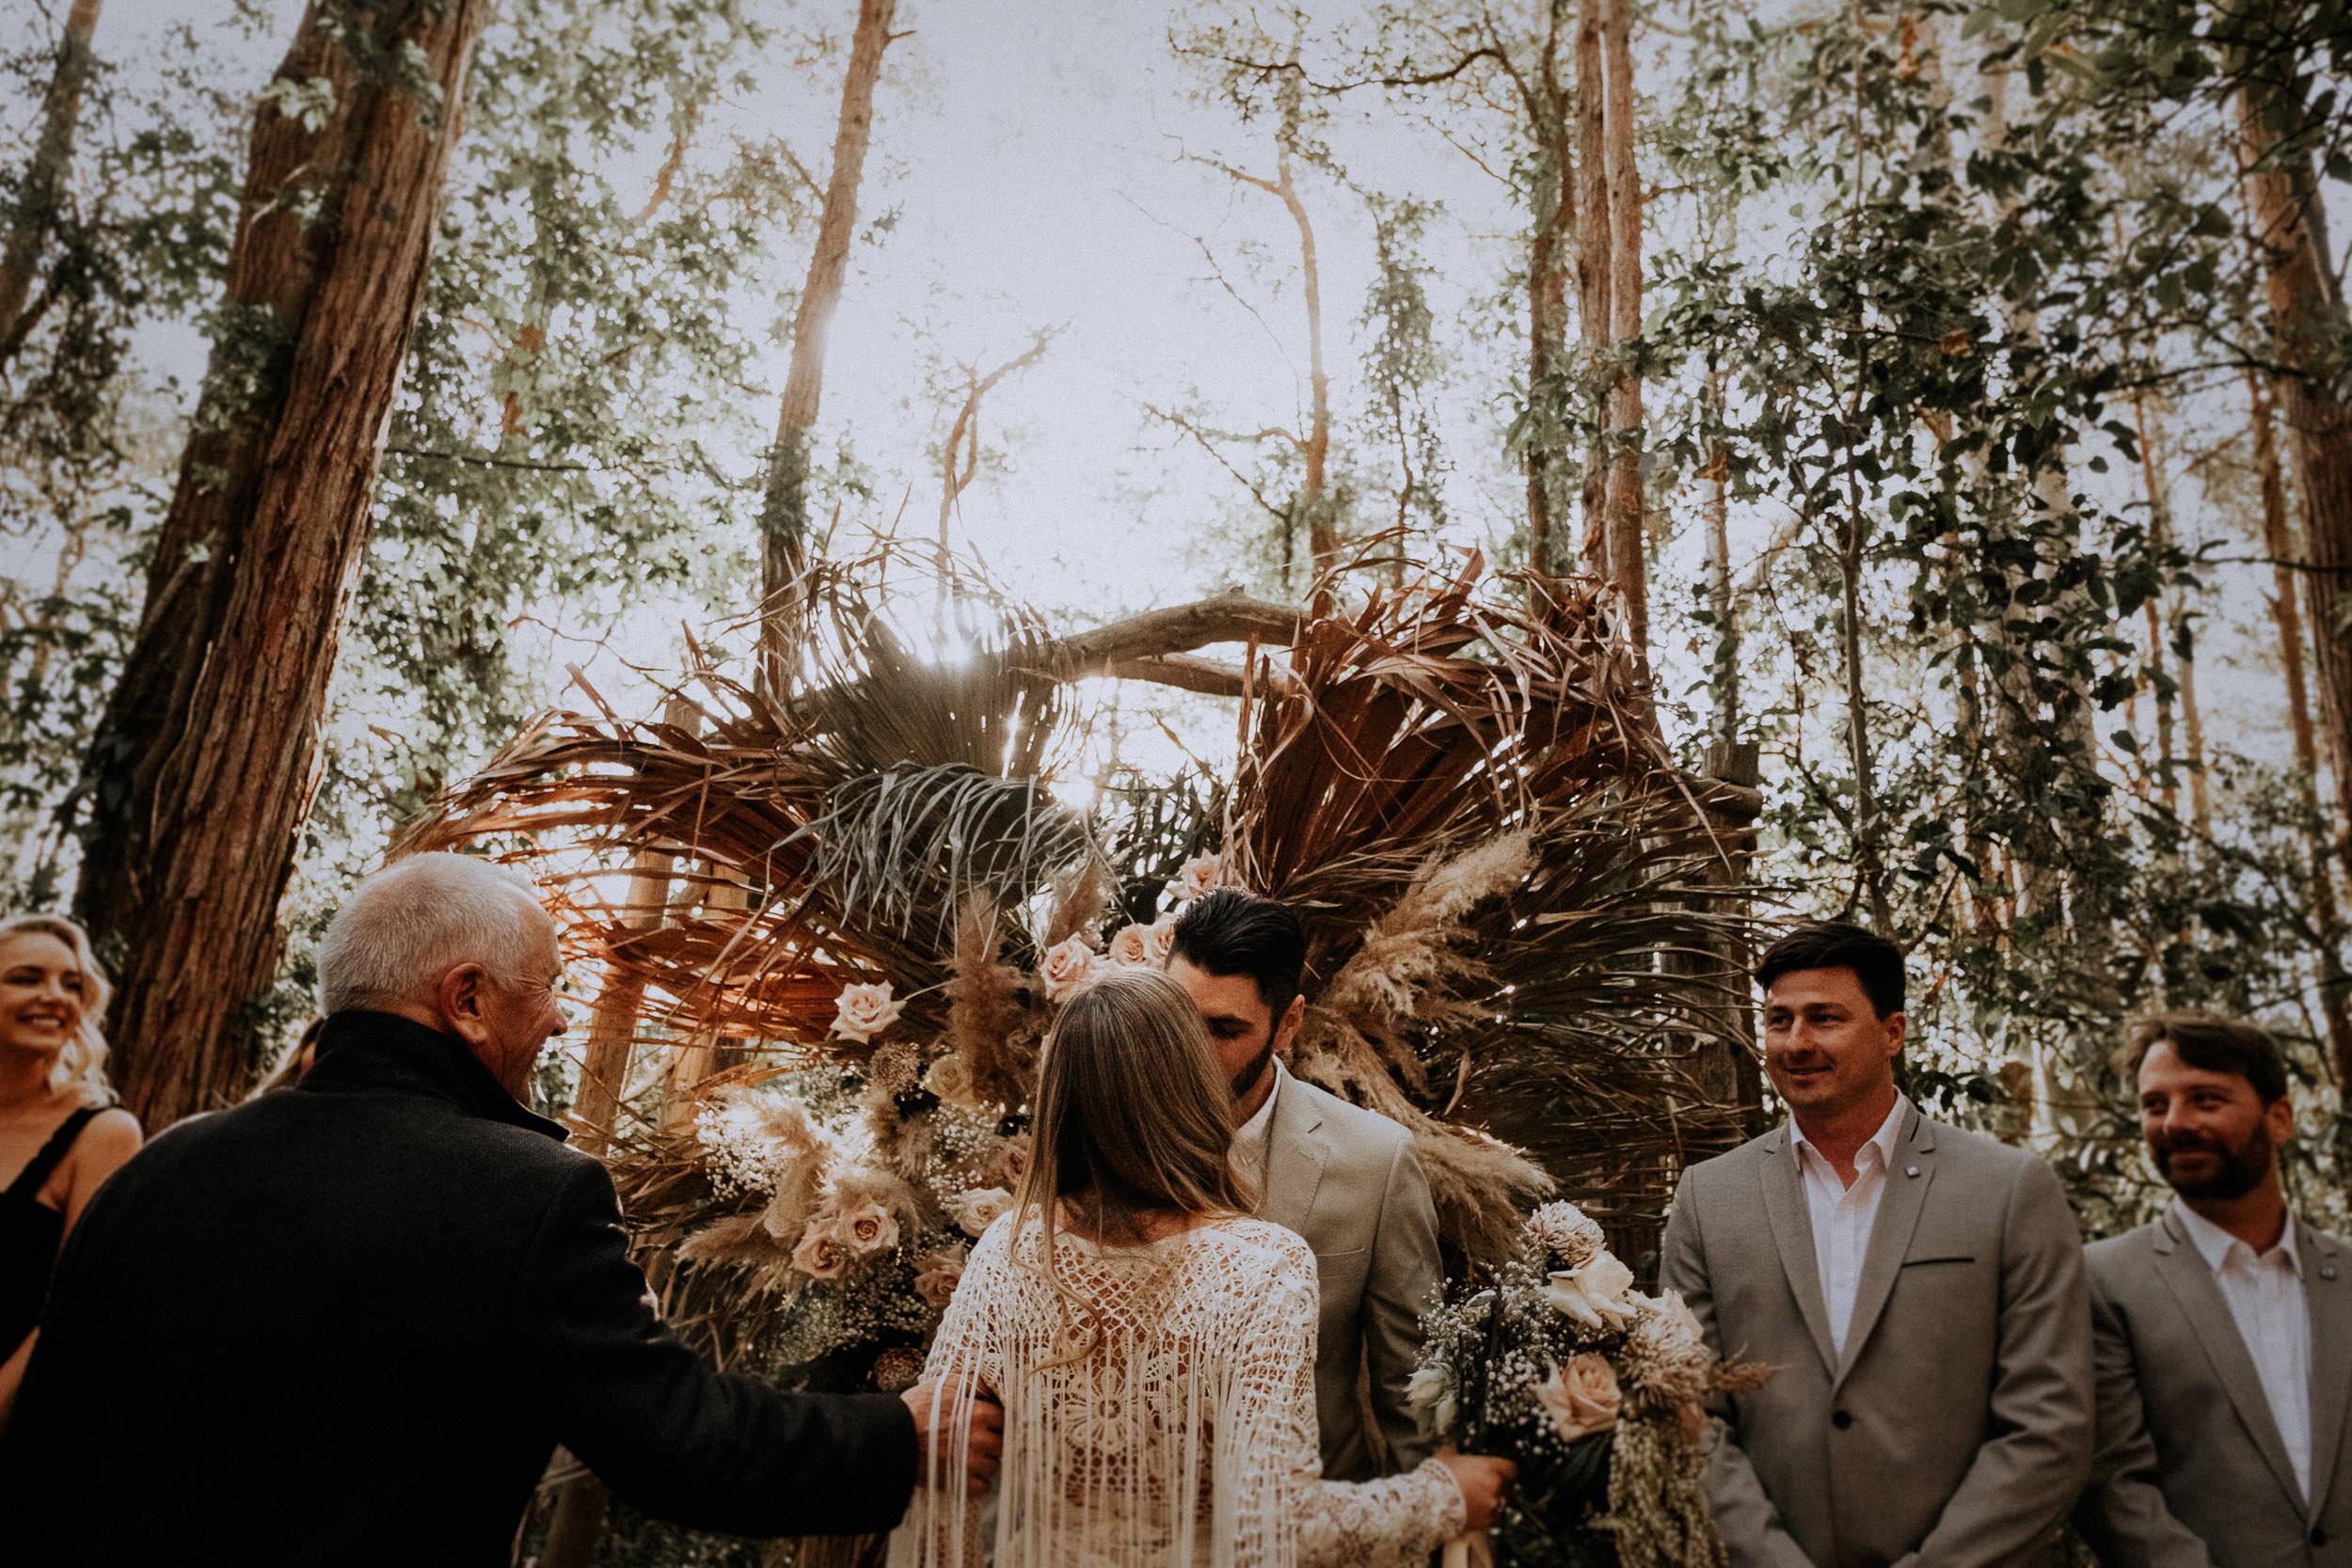 S&A Elopement - Kings & Thieves - Shred 'Til Dead - Central Coast Beach Forest Wedding - 172.jpg